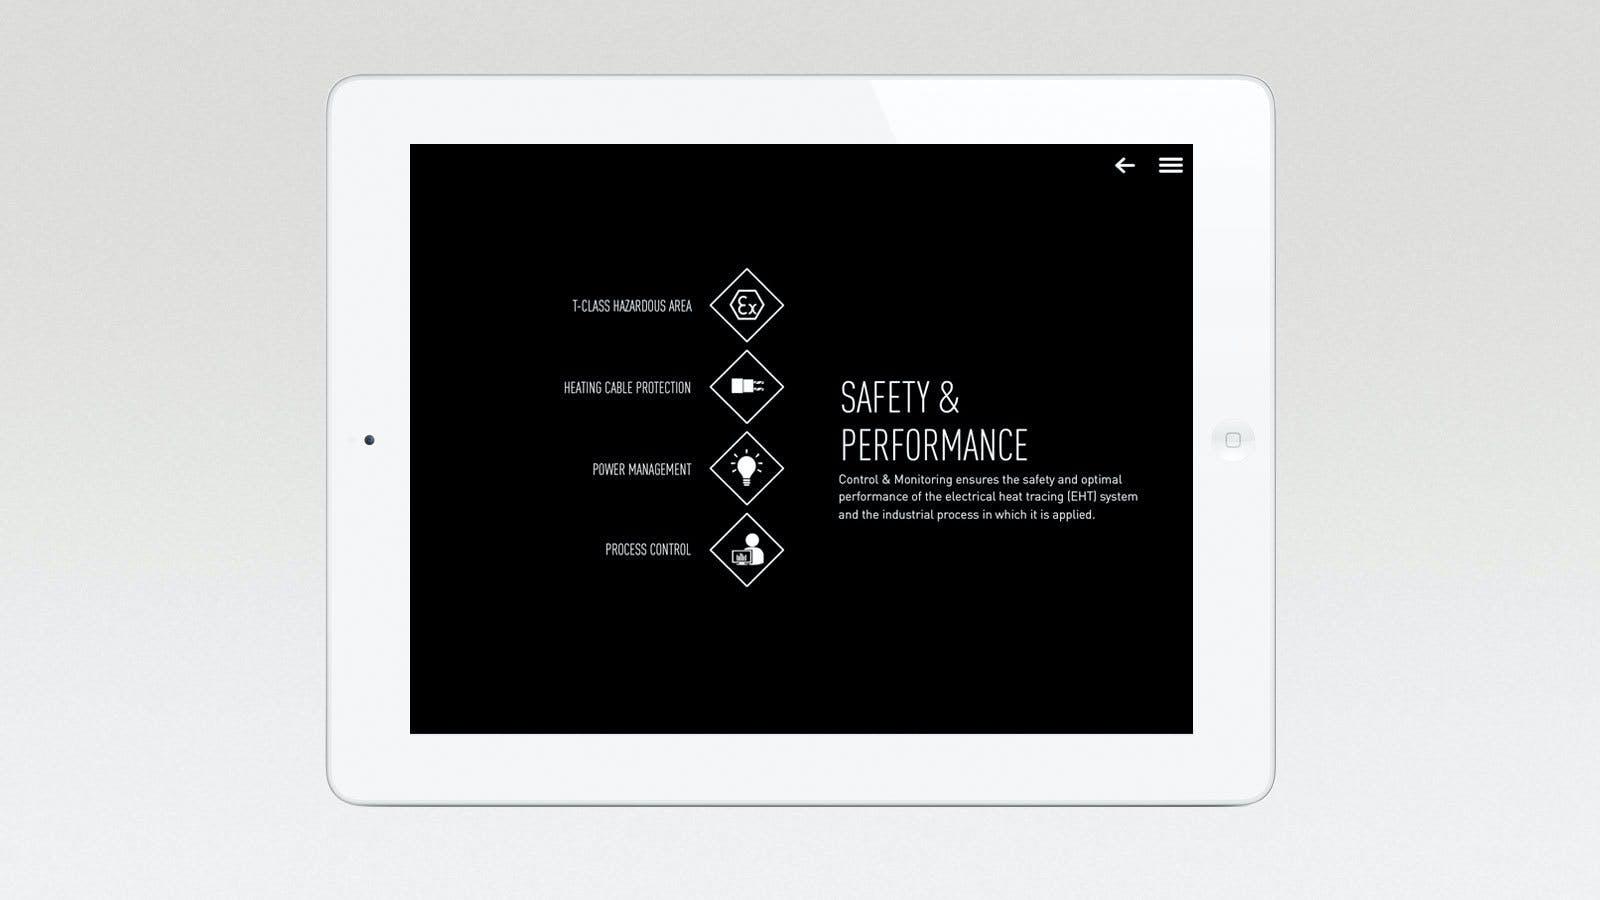 Nvent sales app G3